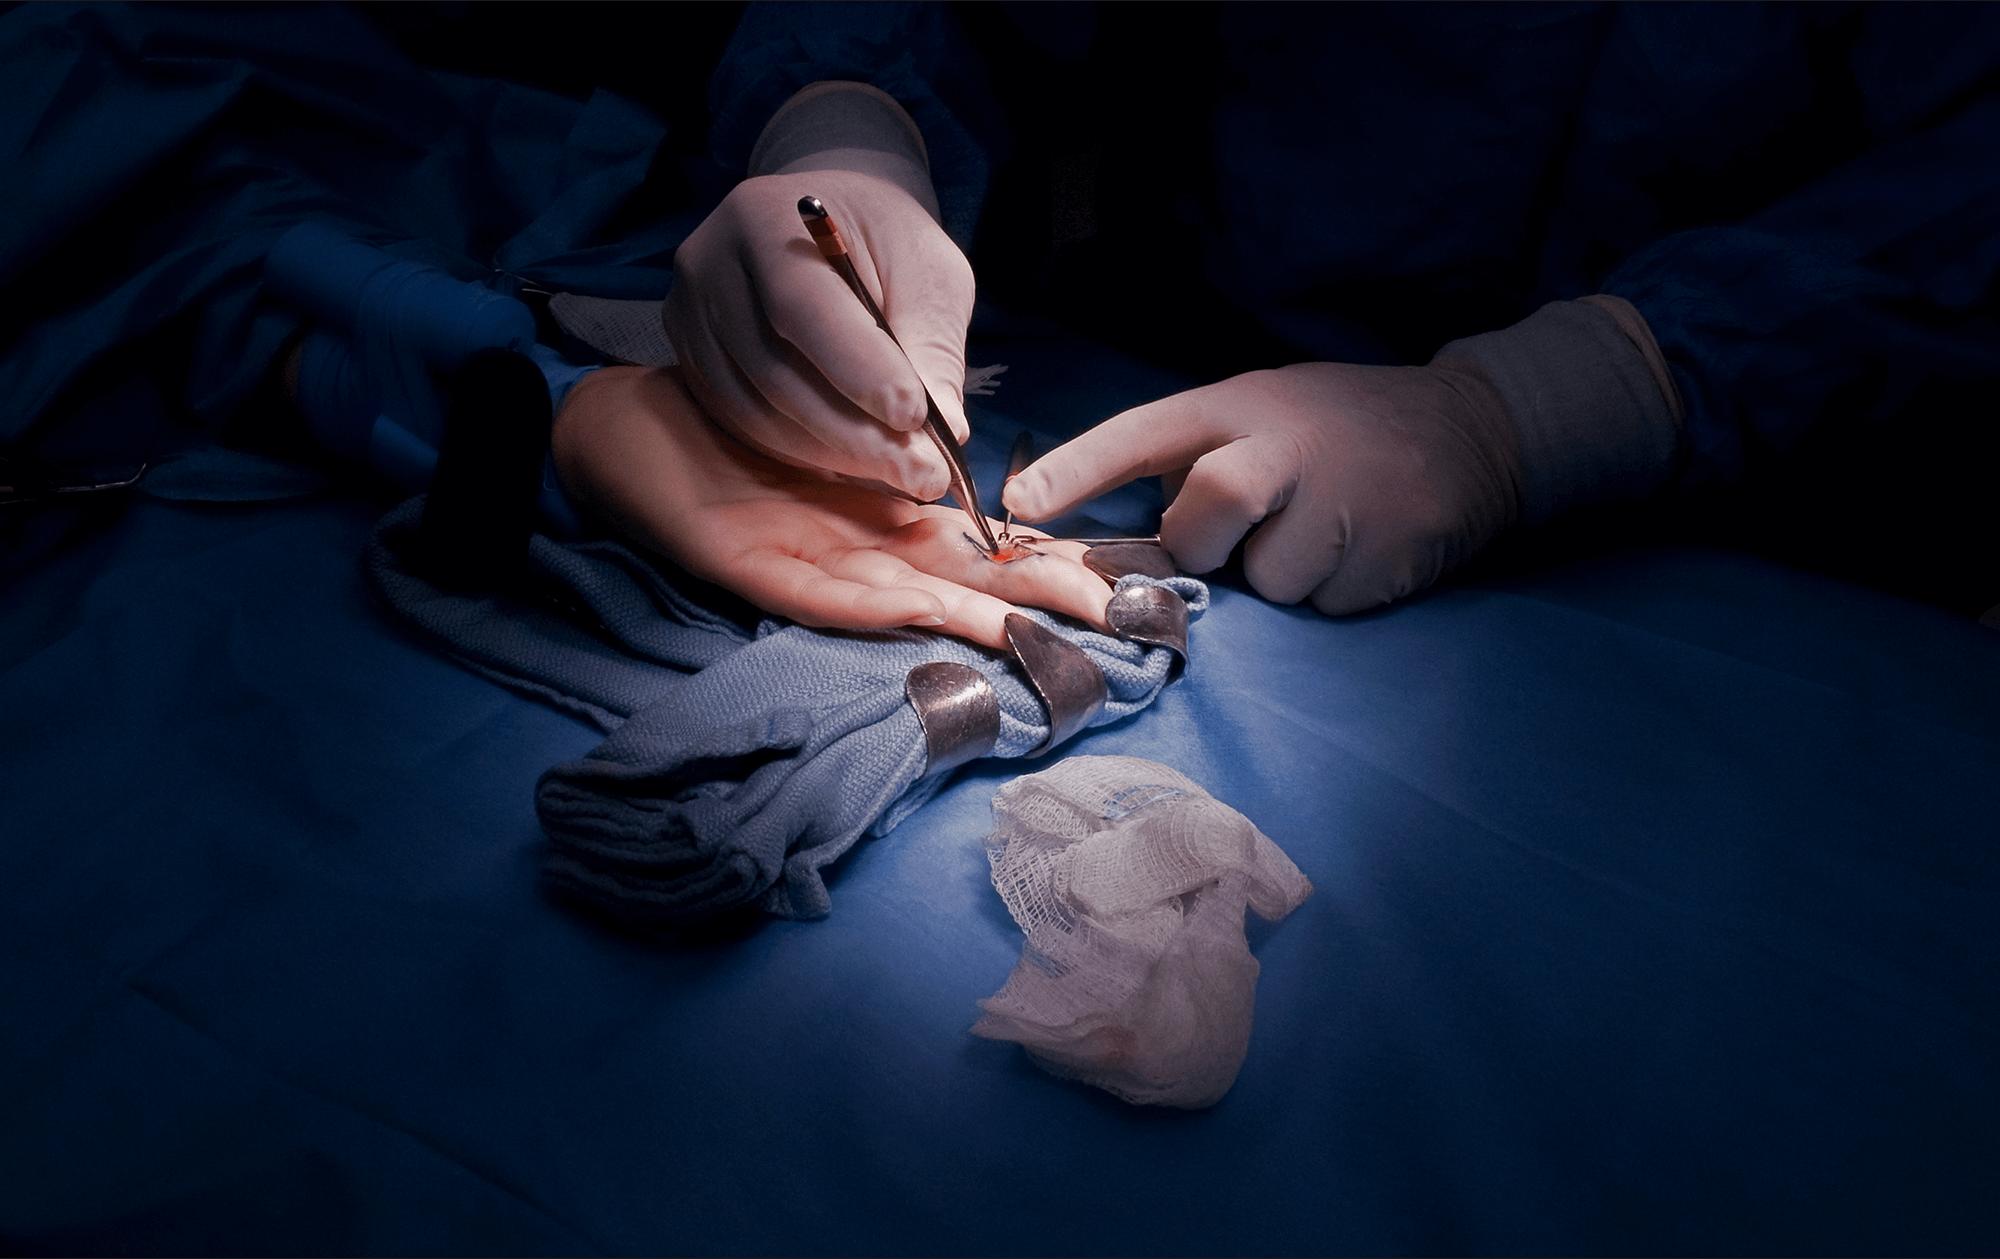 Hand Surgery